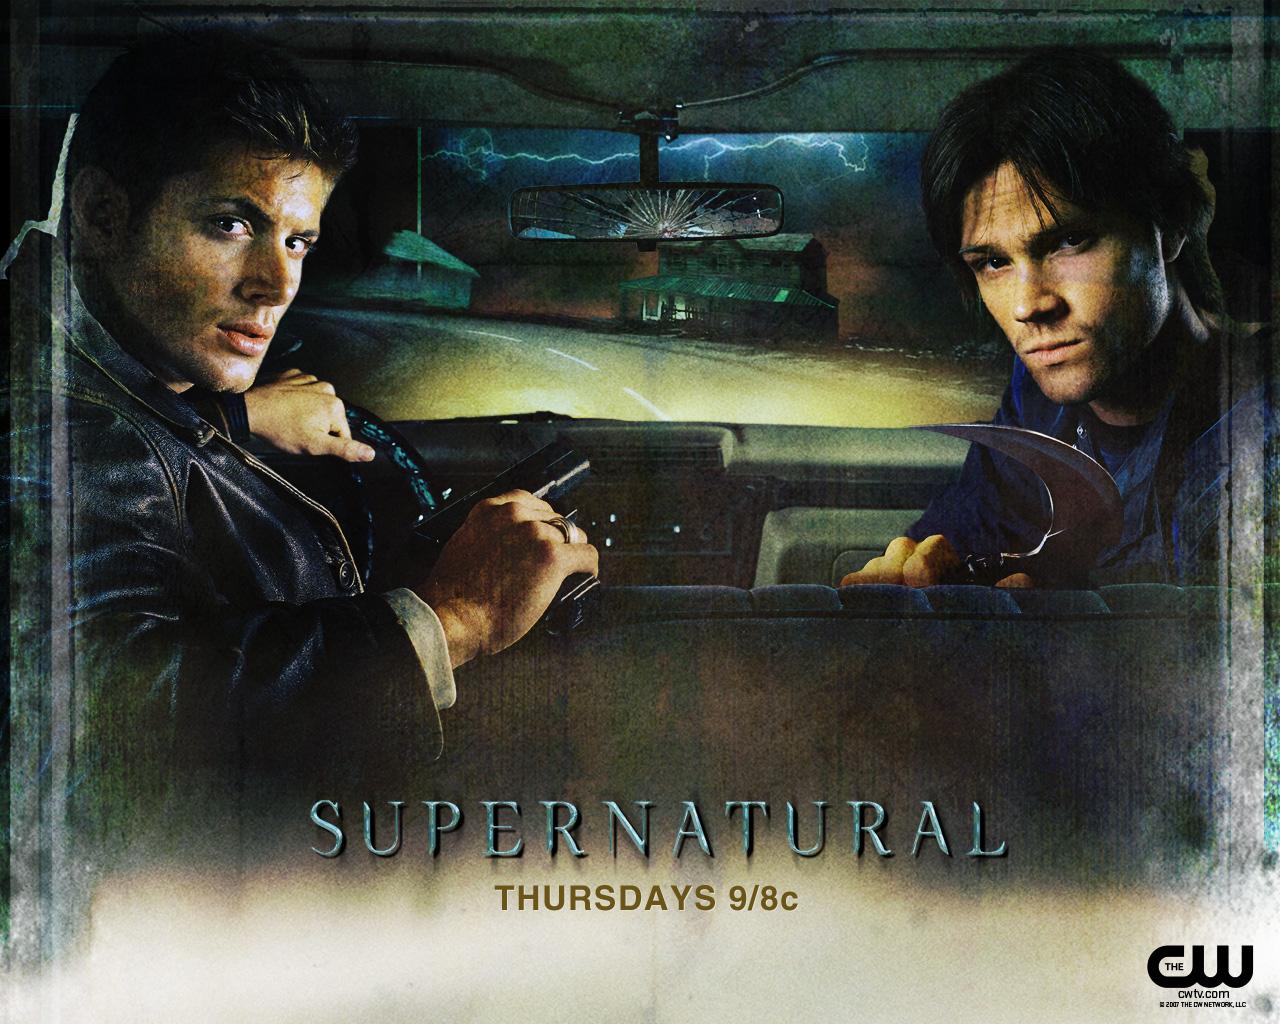 http://2.bp.blogspot.com/-7dKagB9sXDM/UGyyrGnGfcI/AAAAAAAAAB8/Z7NUzB3UJNY/s1600/cw-supernatural-wallpaper-1280.jpg